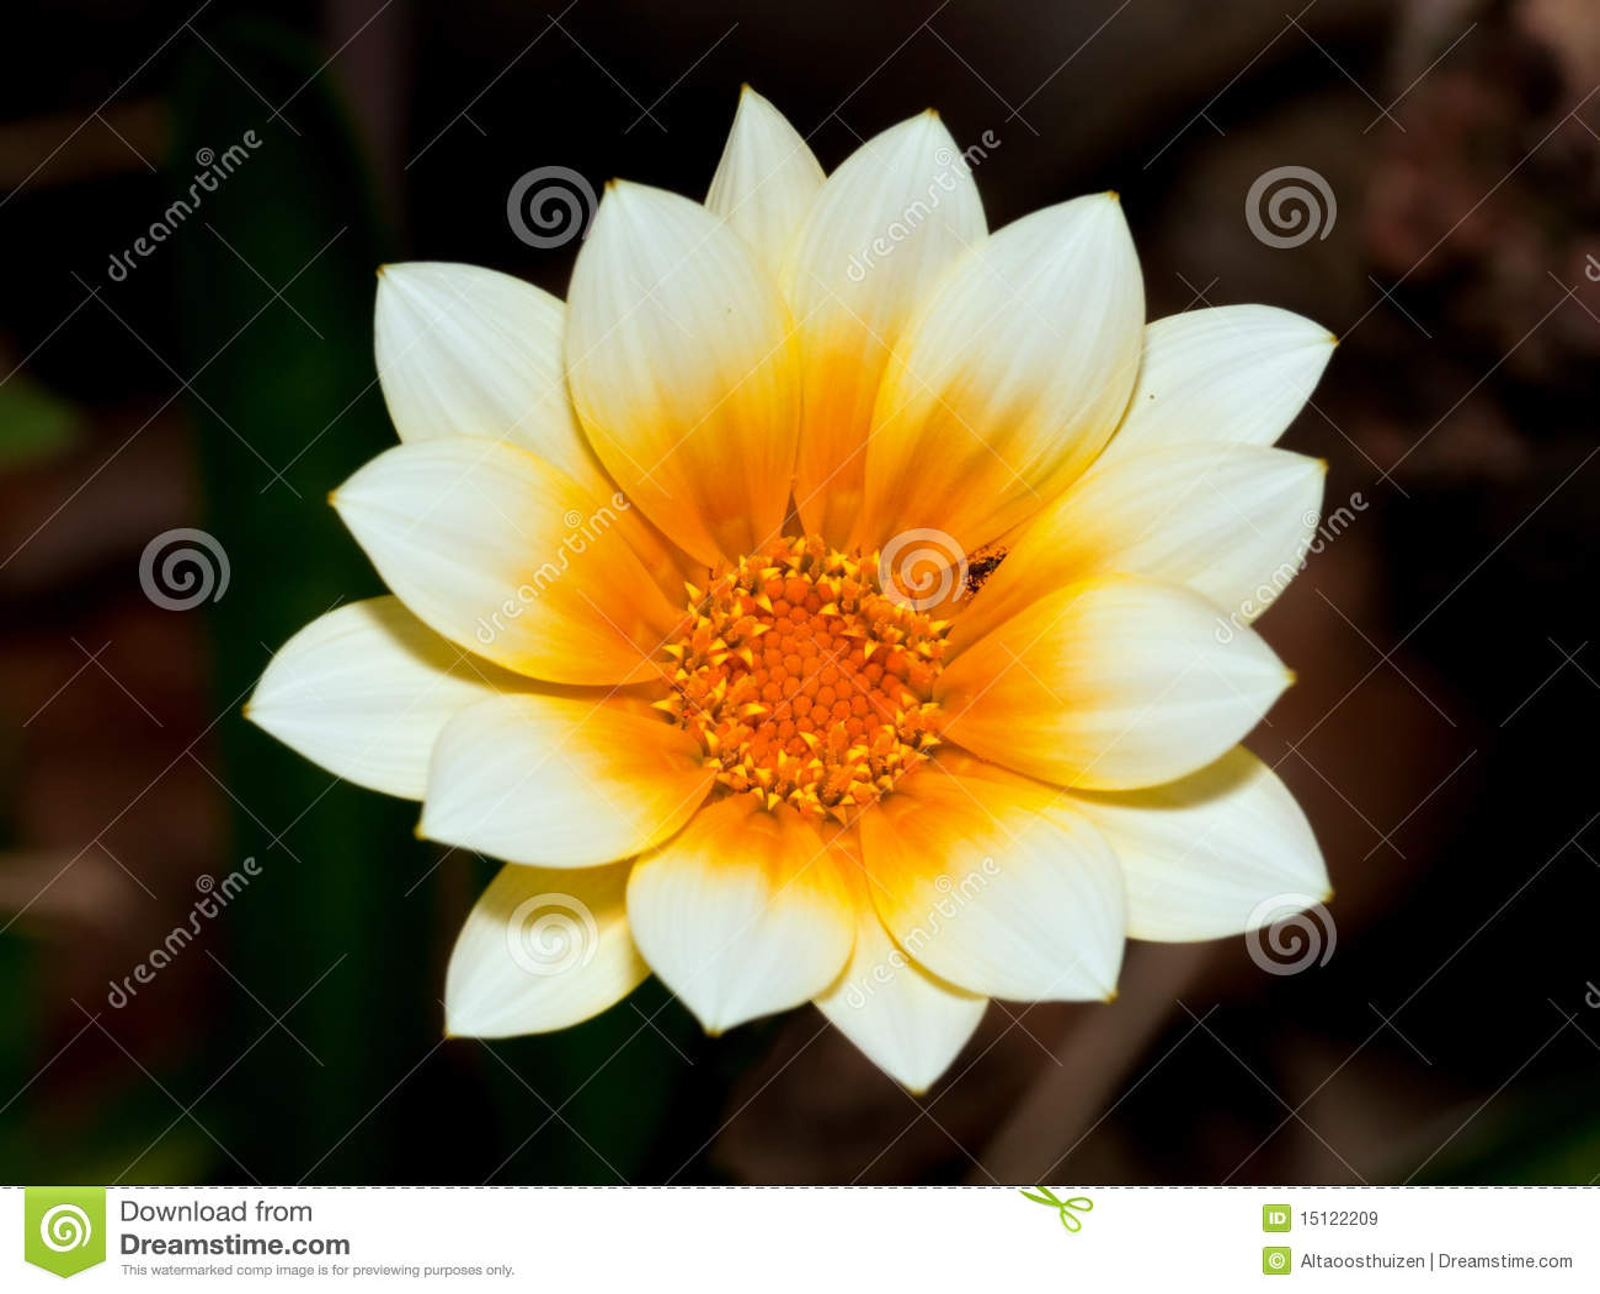 Macro Of White And Orange Flower Stock Image Image Of Bloom